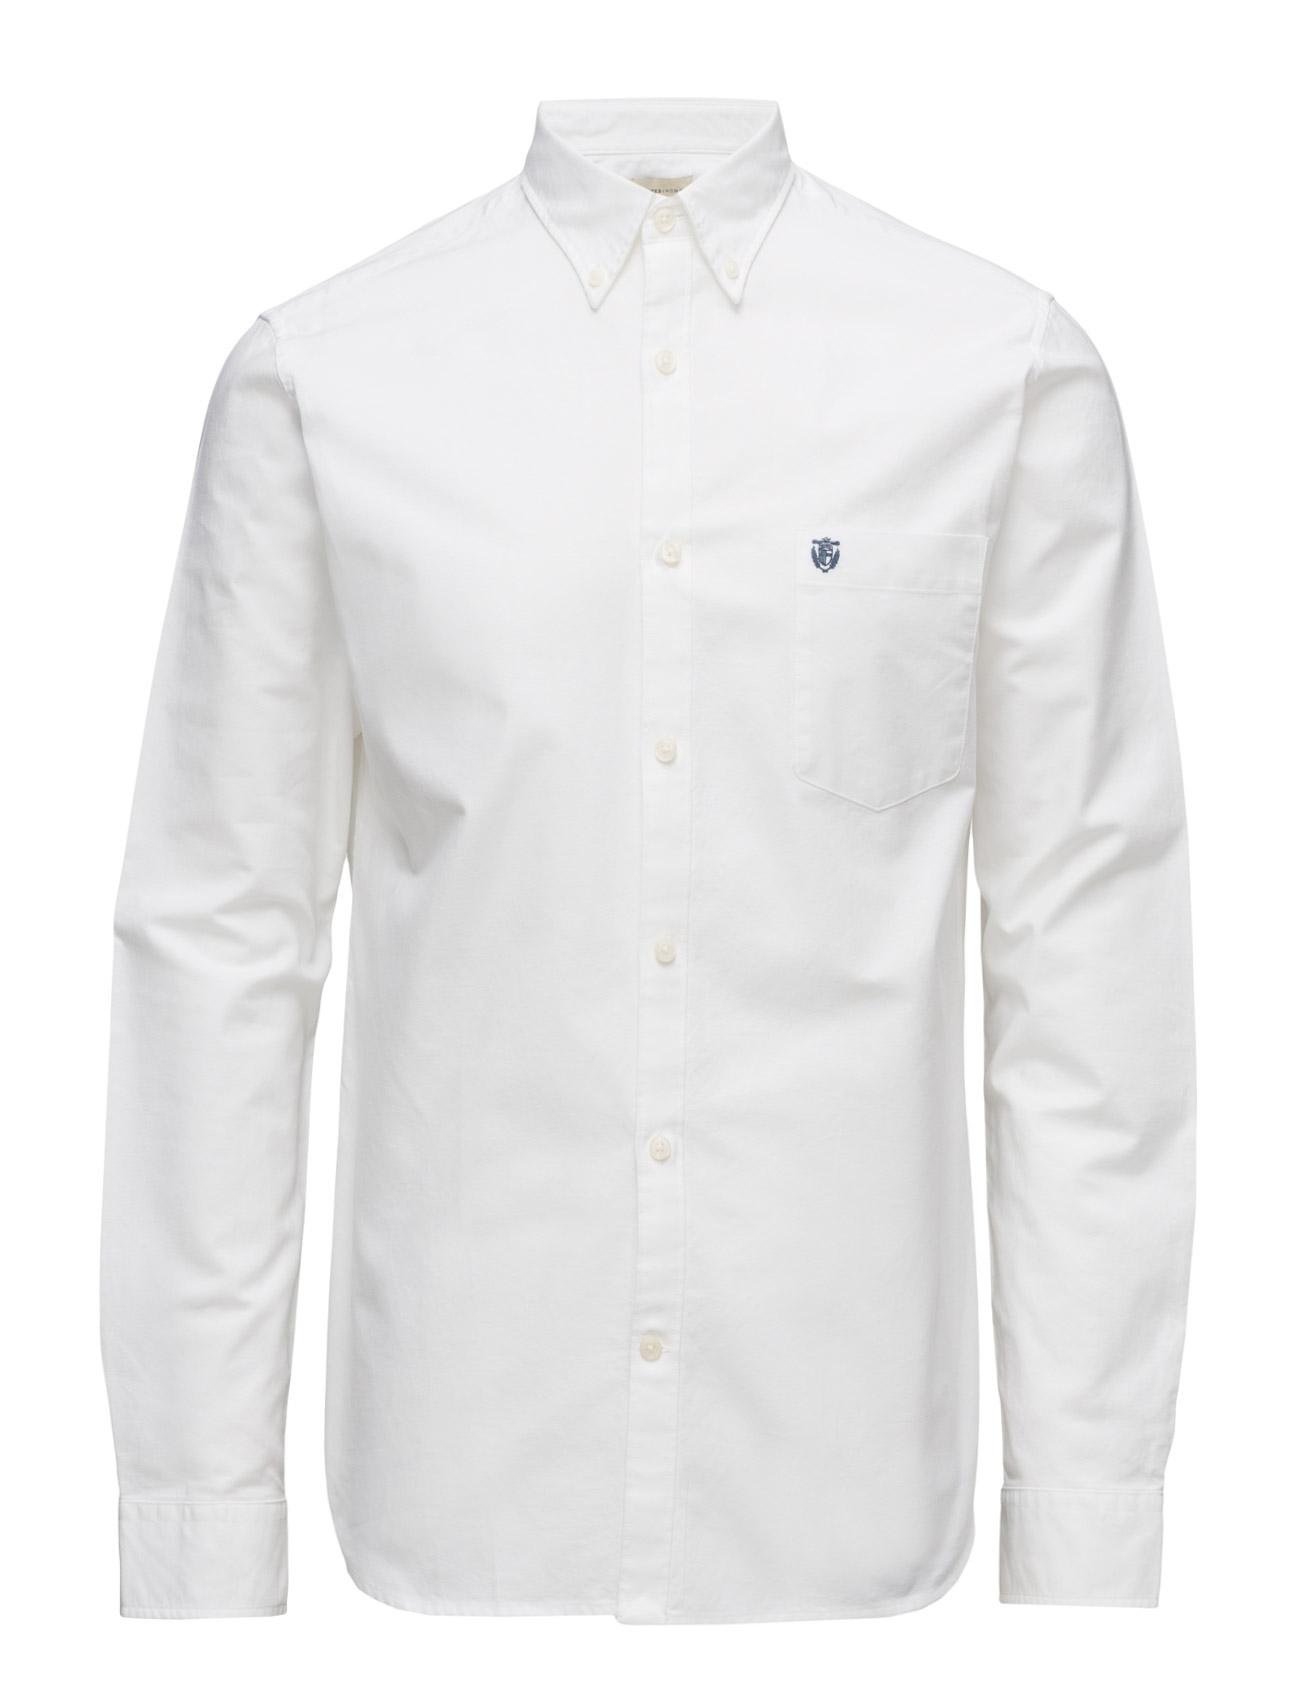 Selected Homme Collect shirt ls r NOOS H Ögrönlar